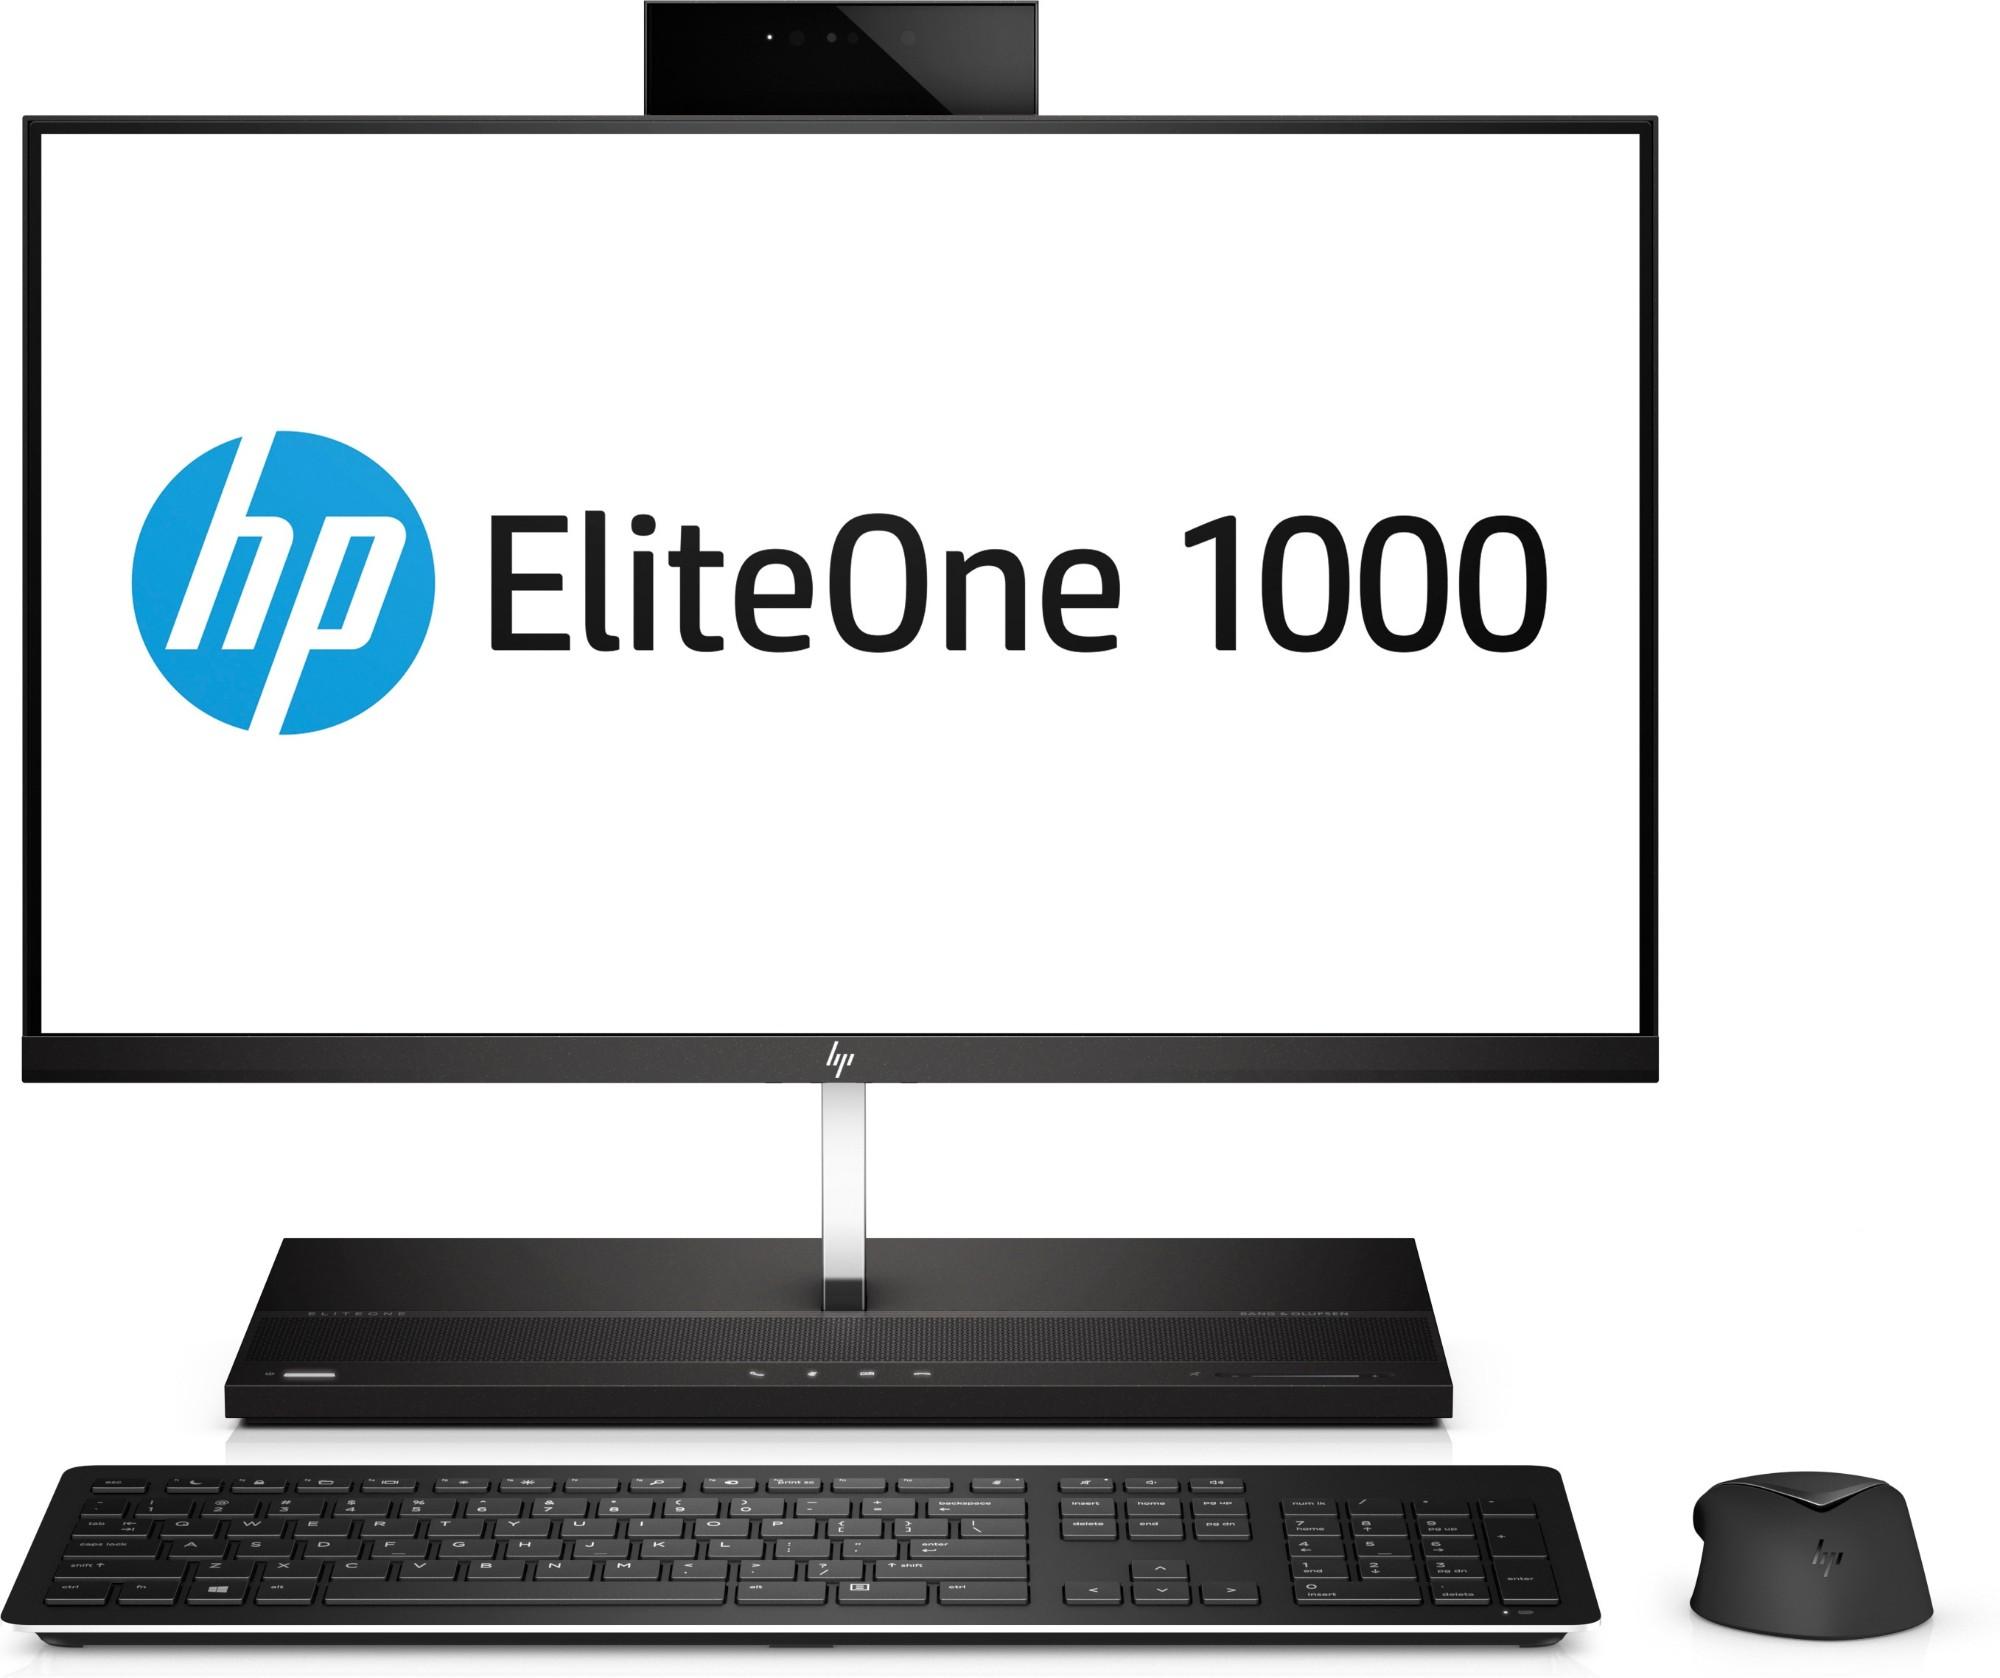 "HP EliteOne 1000 G2 60.5 cm (23.8"") 1920 x 1080 pixels Touchscreen 8th gen Intel® Core™ i5 i5-8500 8 GB DDR4-SDRAM 256 GB SSD Black All-in-One PC"